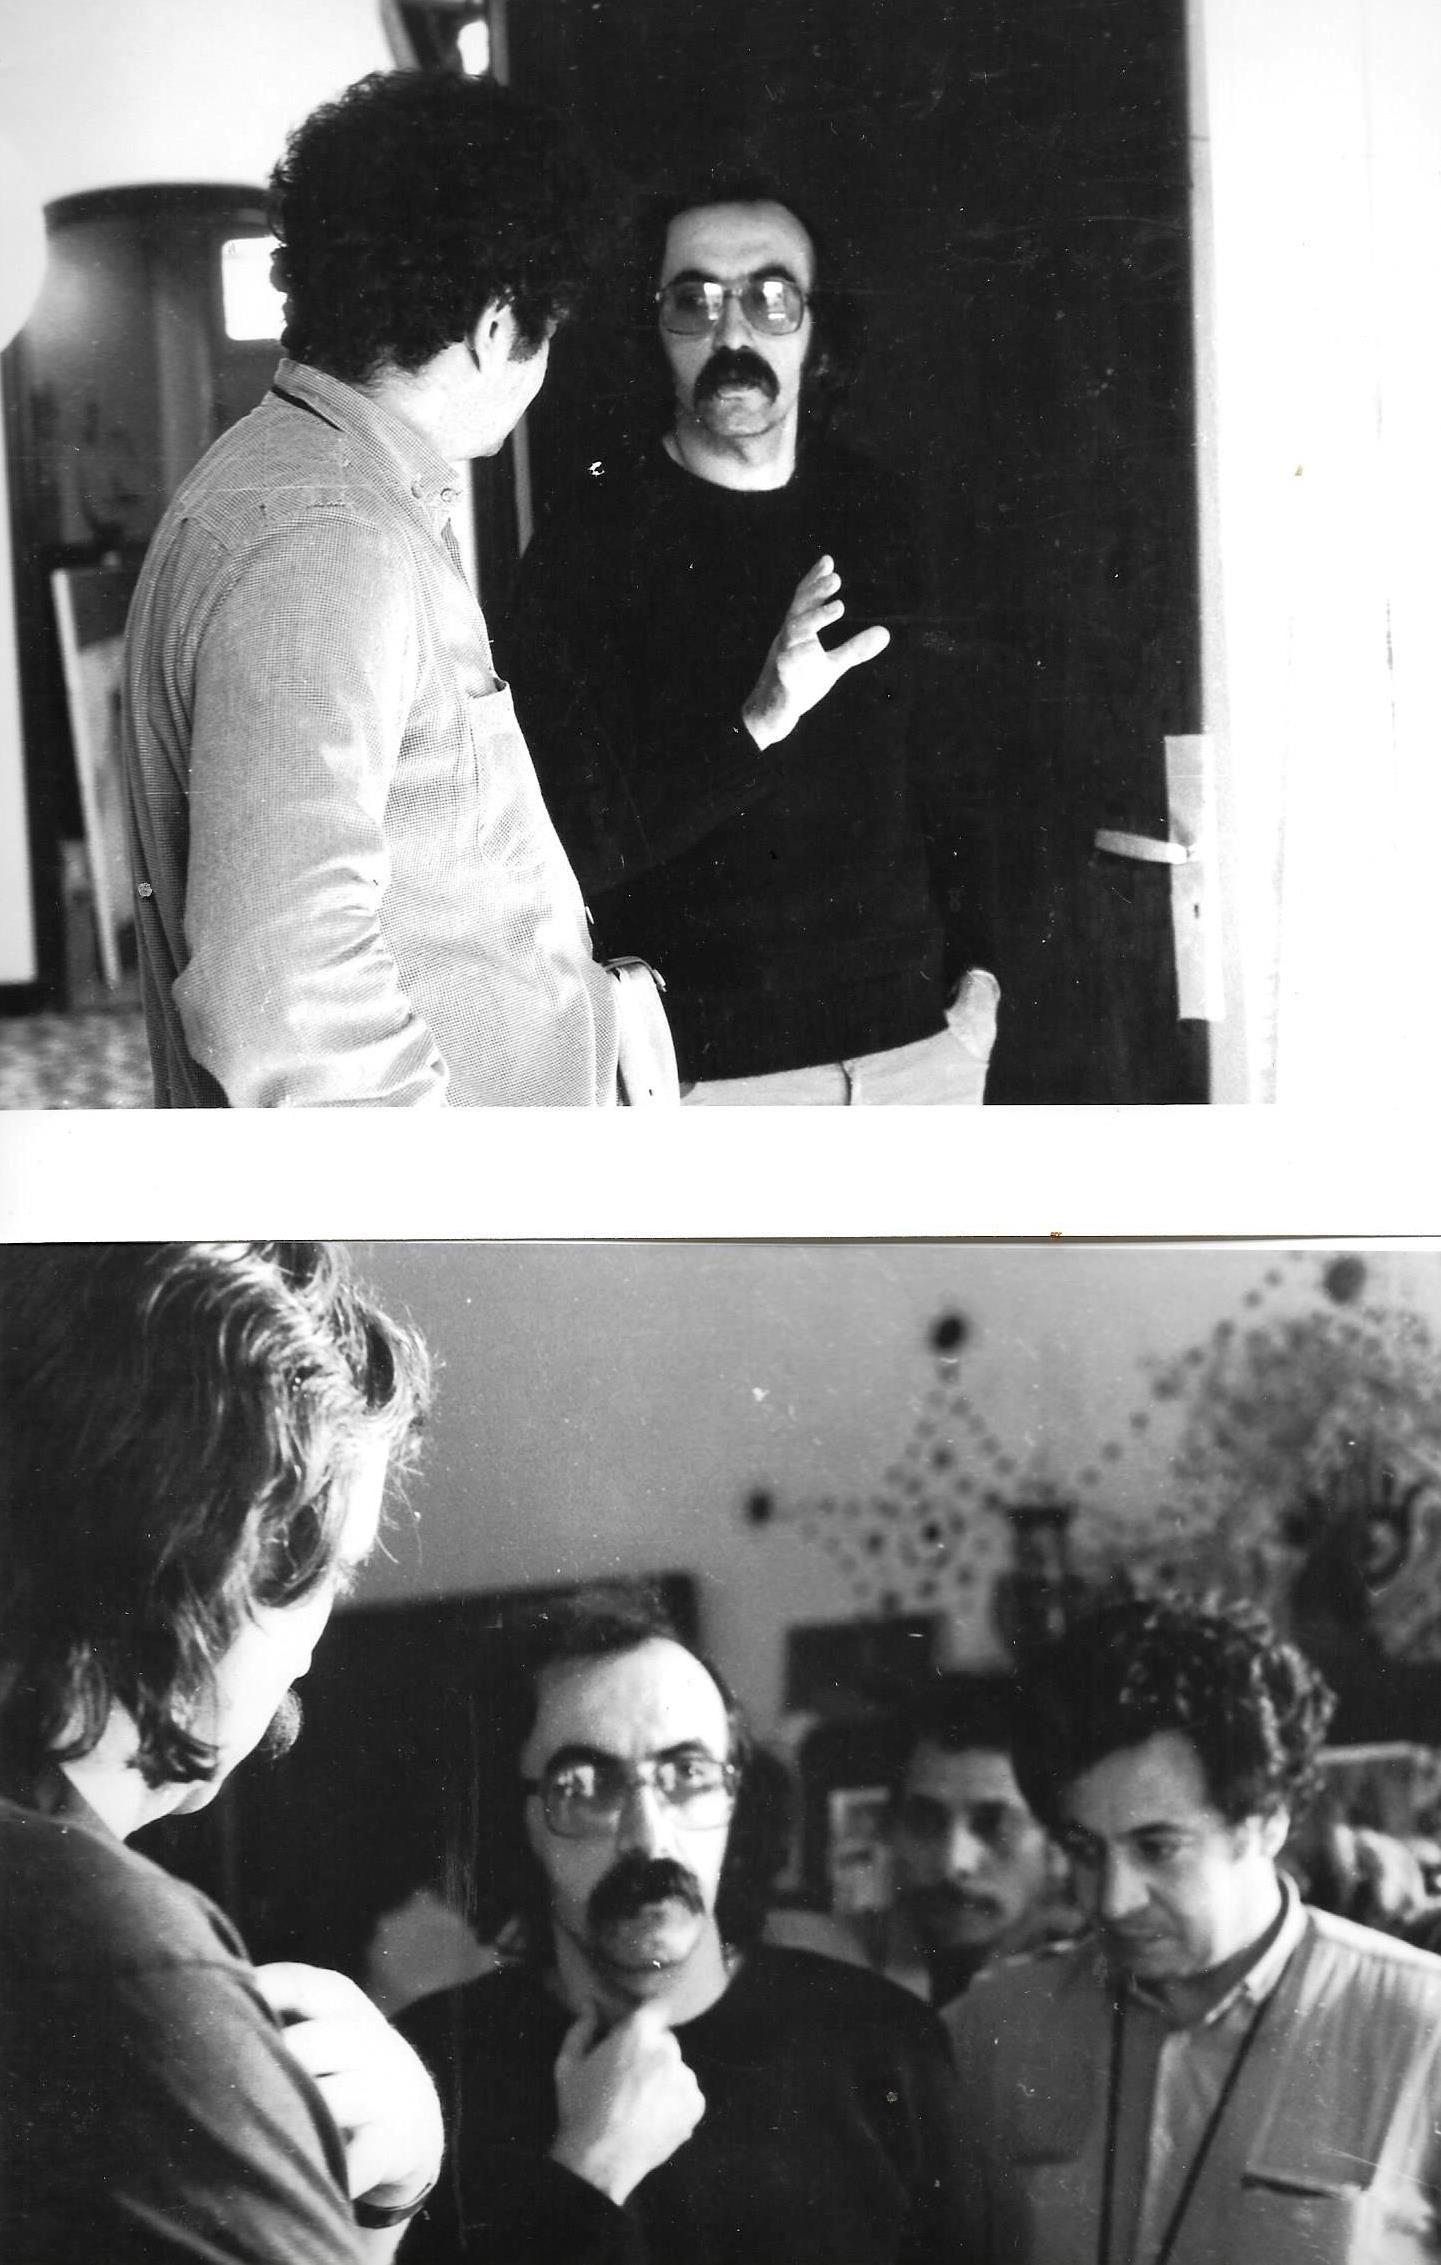 JP-Lledo-et-Chef-op-Smail-Lakhdar-Hamina--Tournage-2-films-sur-Peinture-Denis-Martinez,-Blida,-1984